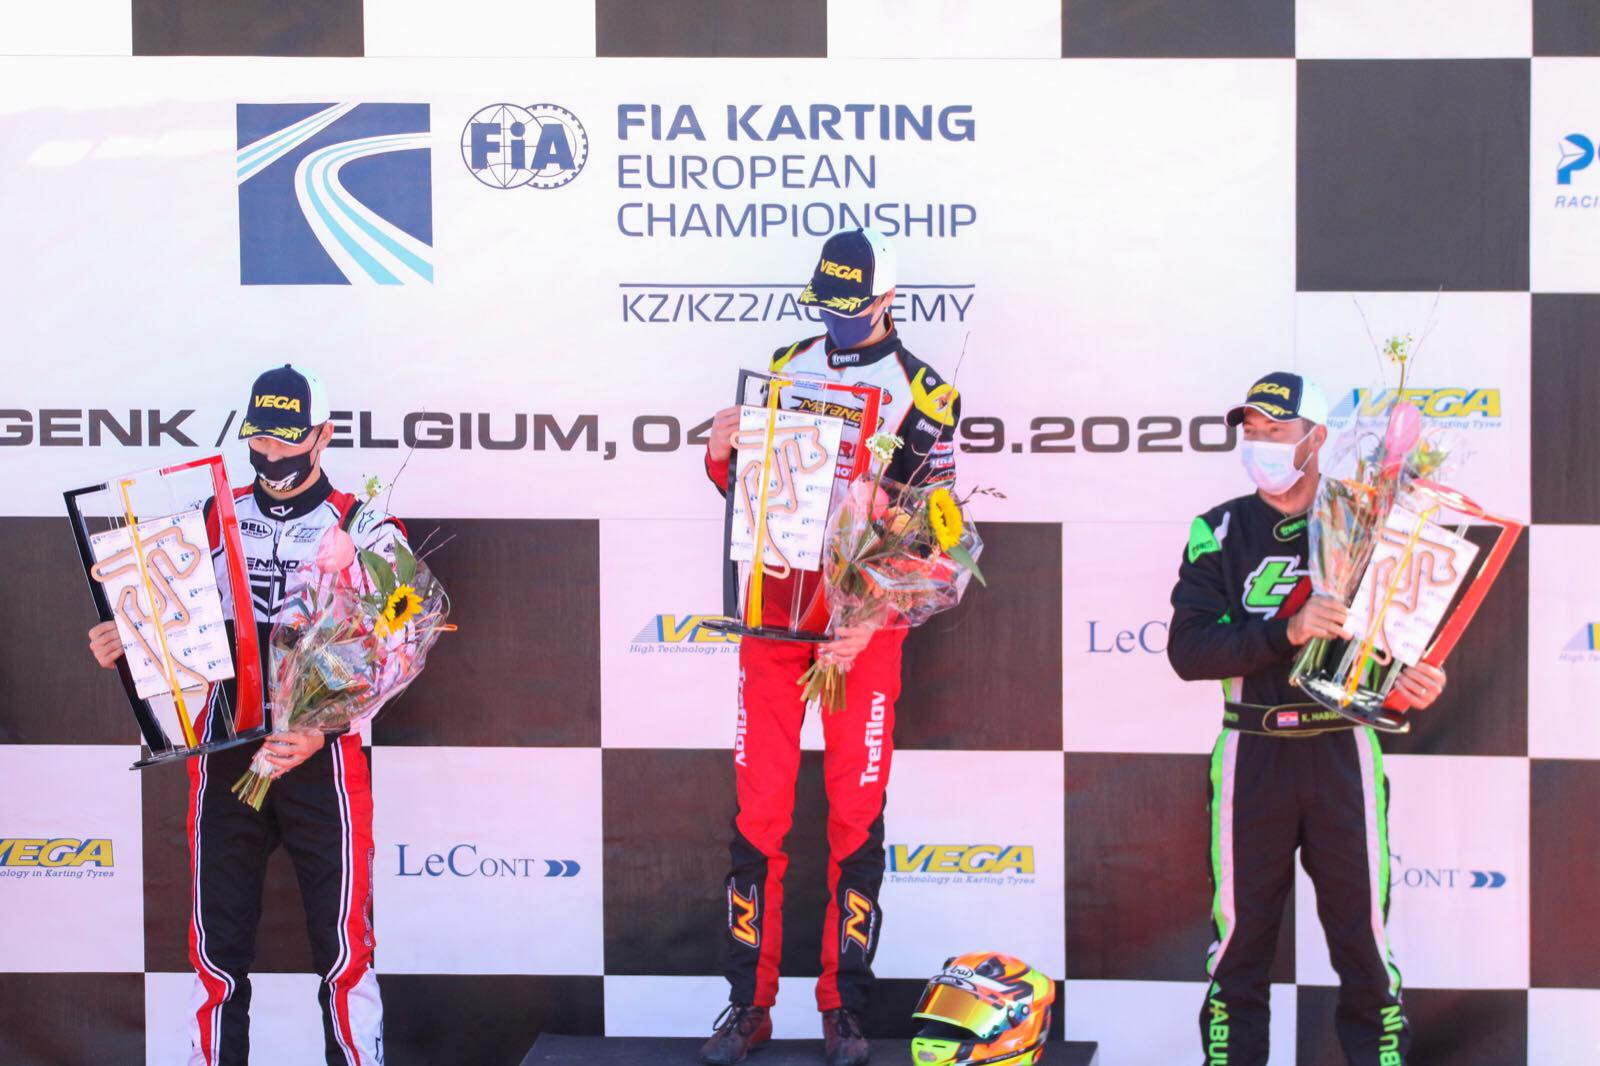 FIA Karting European Championship – Pex e Trefilov vincono la gara, Kremers e Gustavsson campioni!